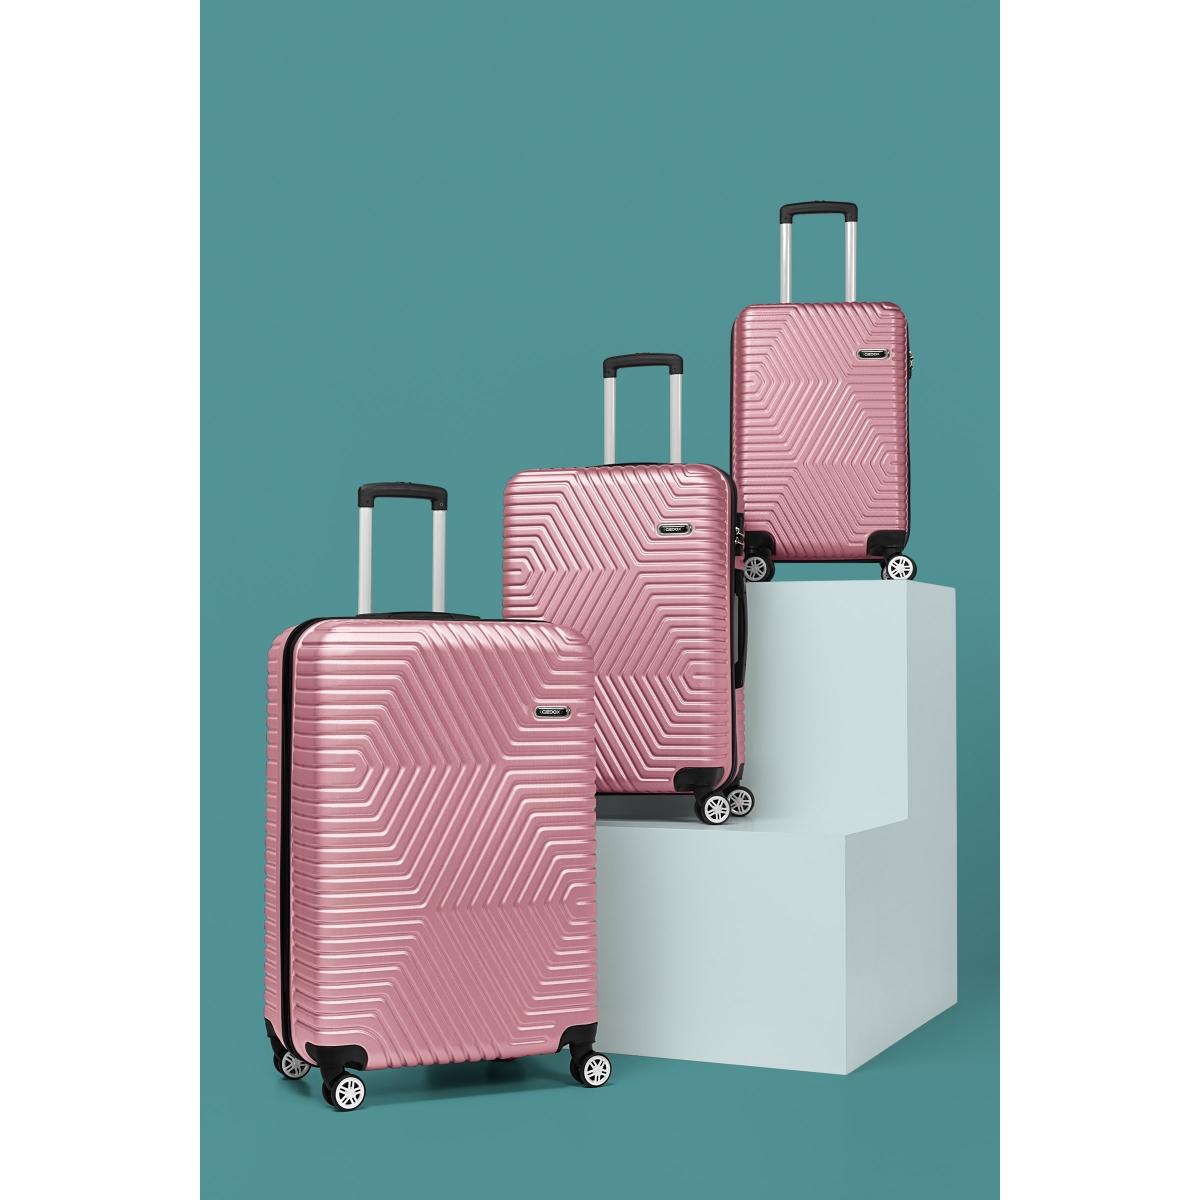 G&D Polo Suitcase ABS 3'lü Lüx Valiz Seyahat Seti - Model:600.08 Gül Kurusu